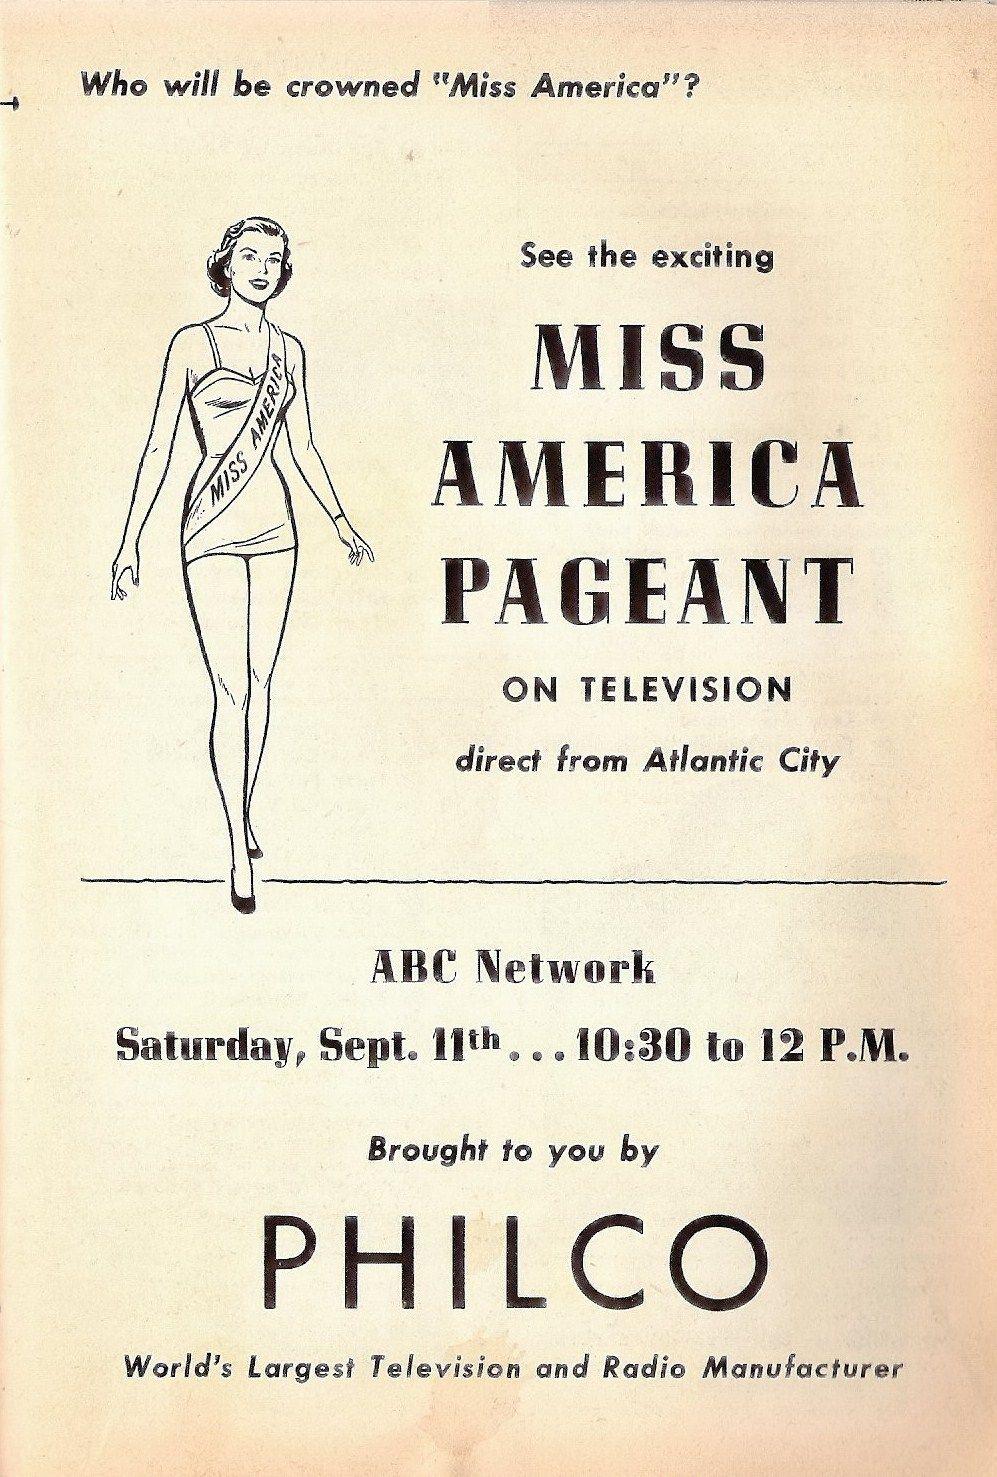 Miss America 1955 Pageant Held September 1954